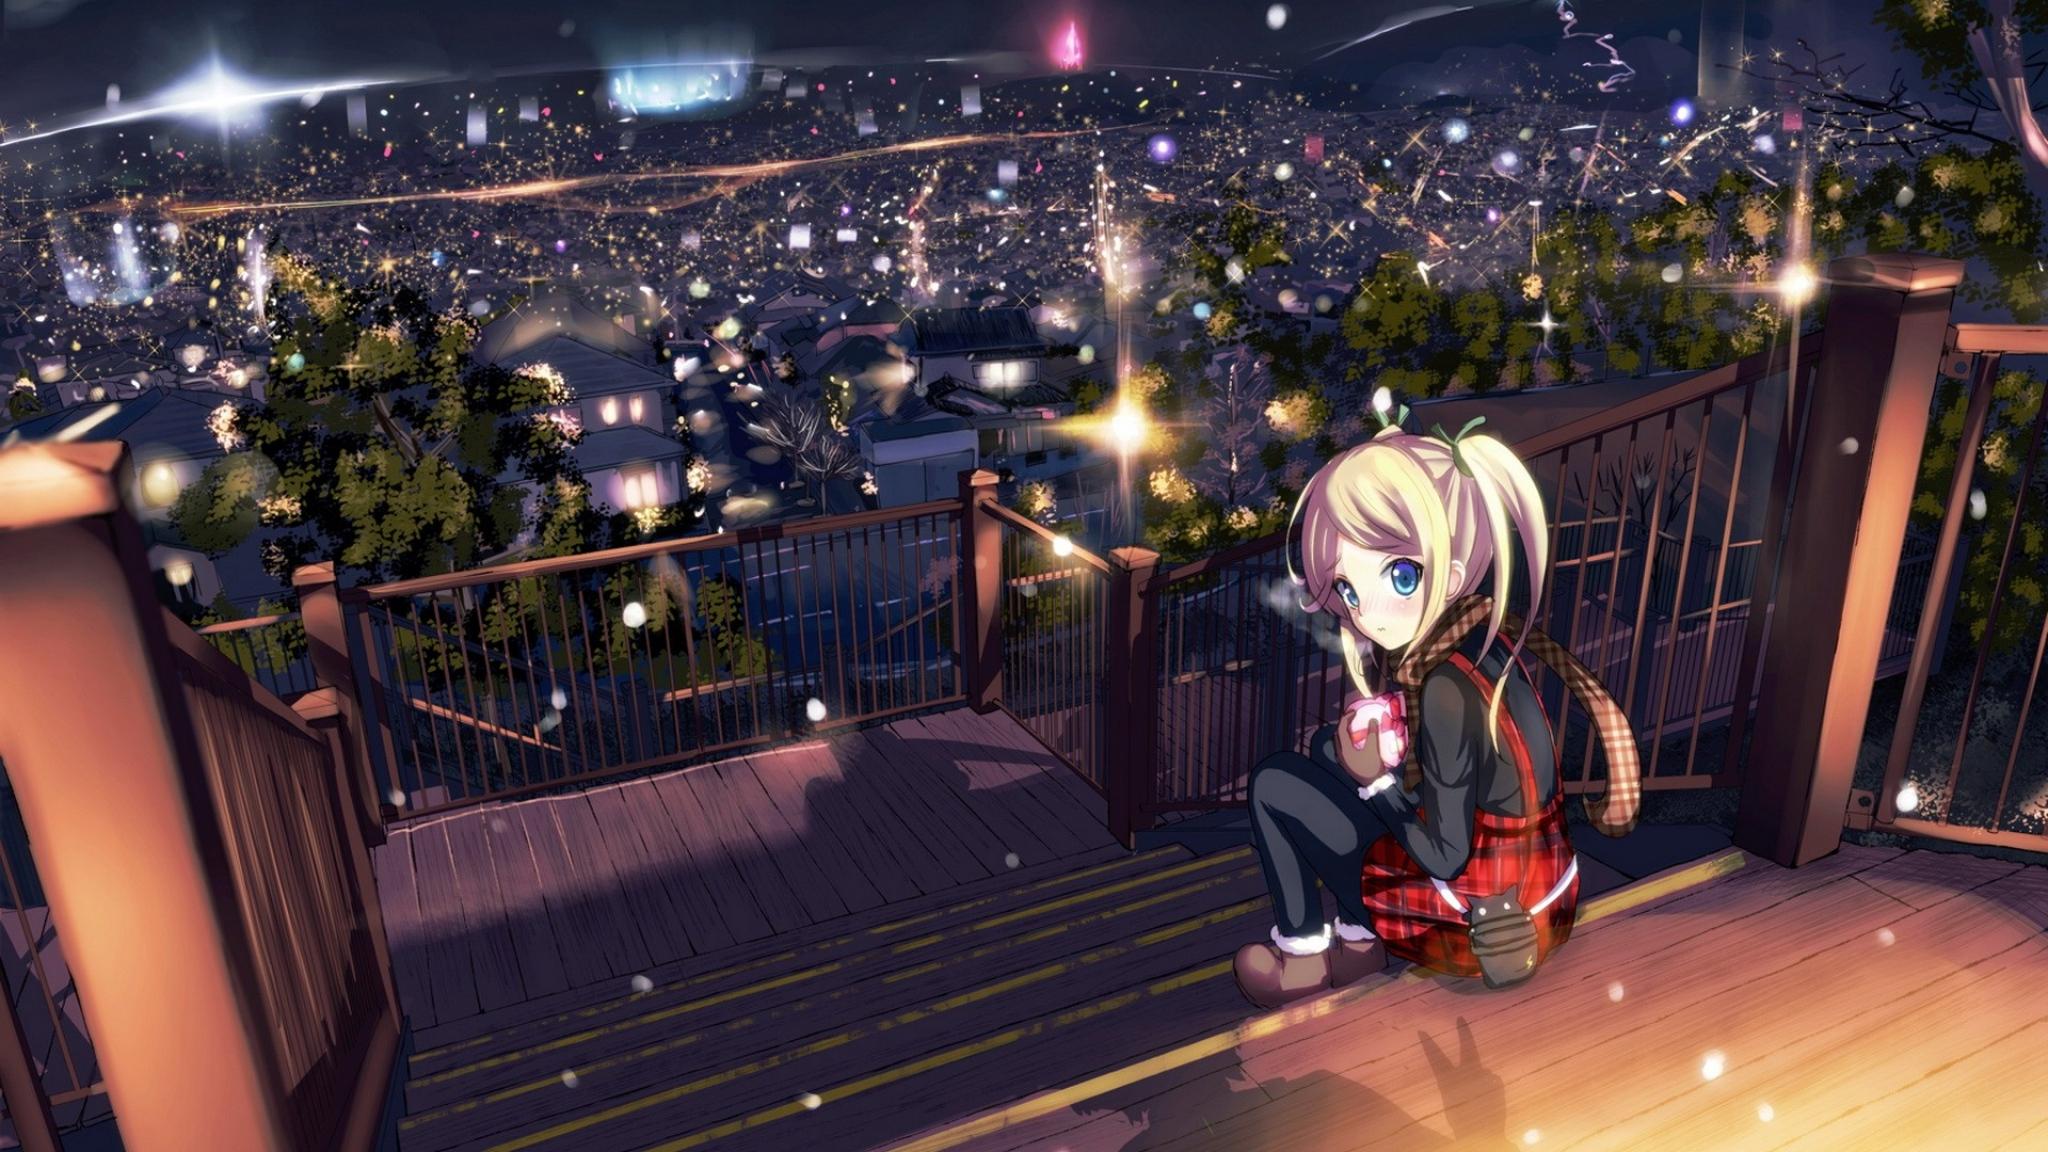 2048x1152 anime wallpaper